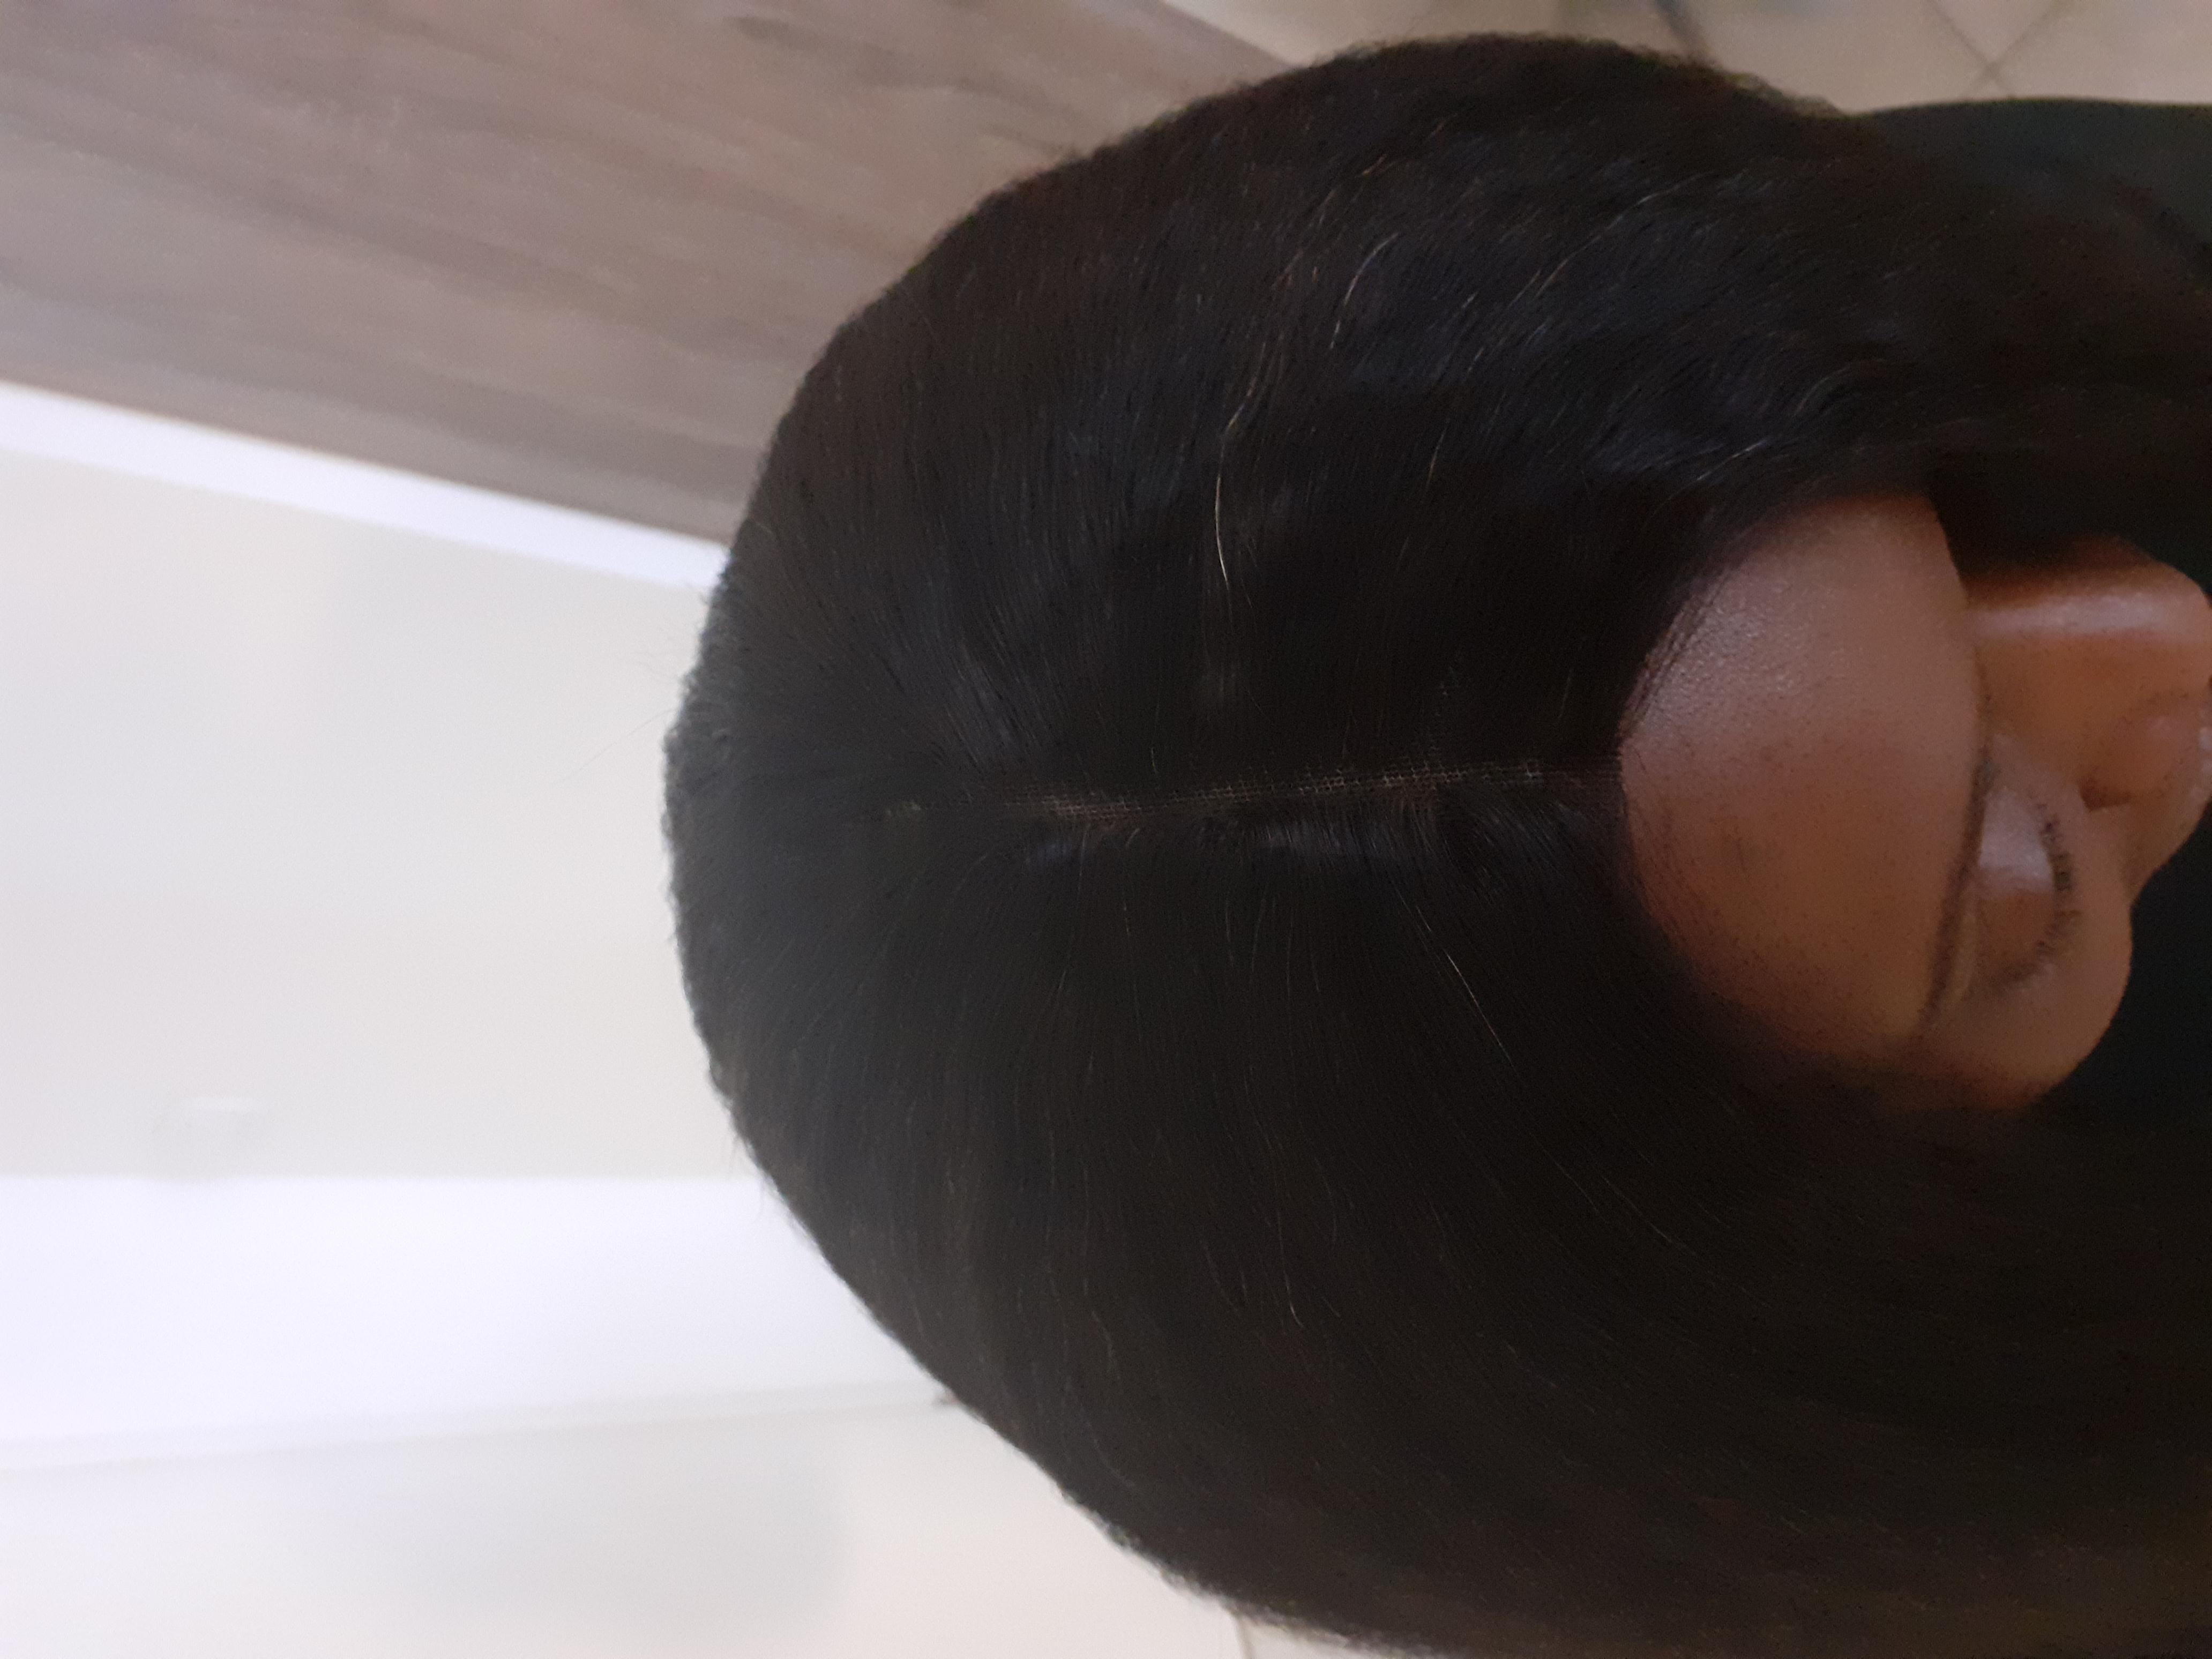 salon de coiffure afro tresse tresses box braids crochet braids vanilles tissages paris 75 77 78 91 92 93 94 95 CVVVSLJI